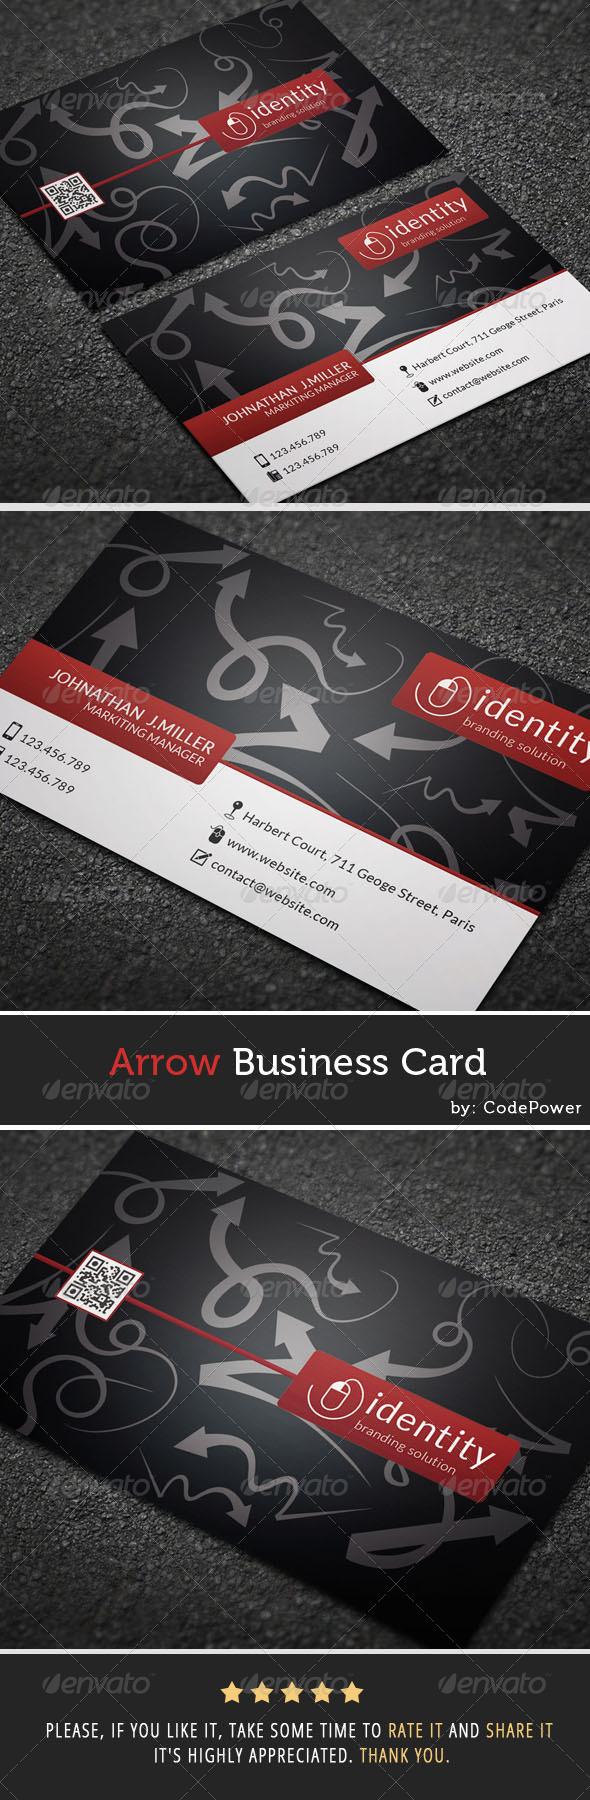 Arrow Business Card - Creative Business Cards